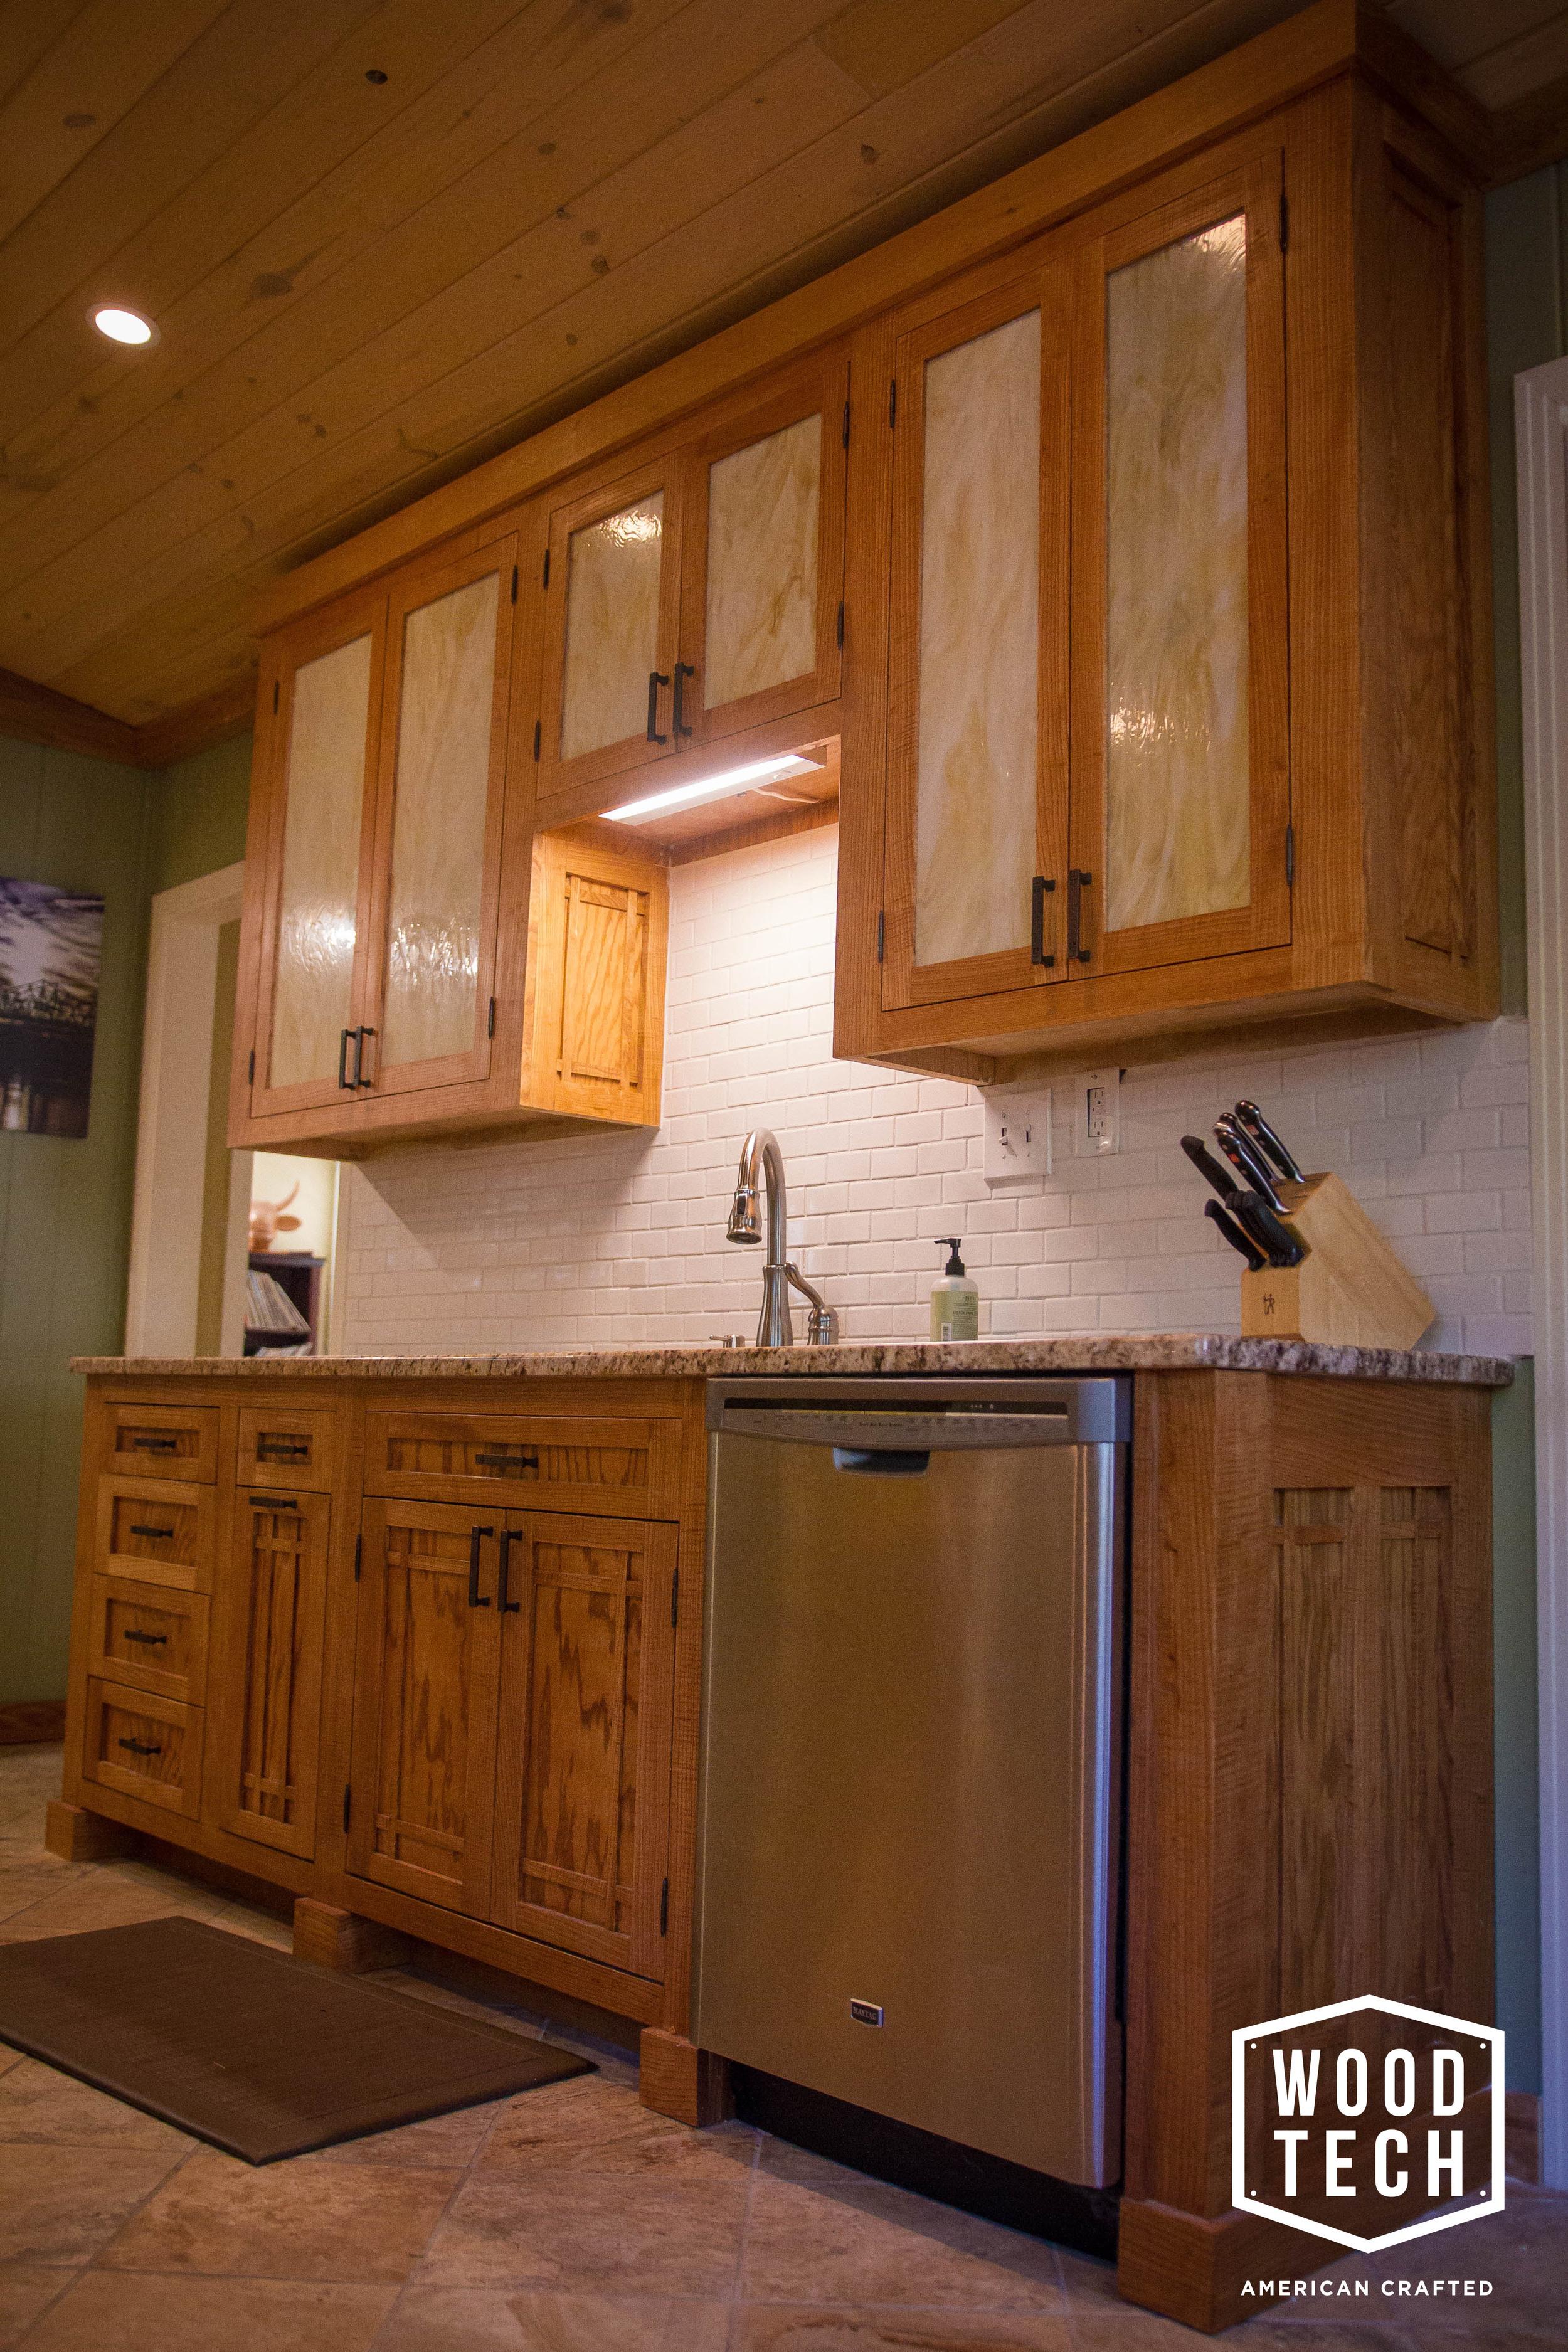 Custom Wood Cabinets with Lighting